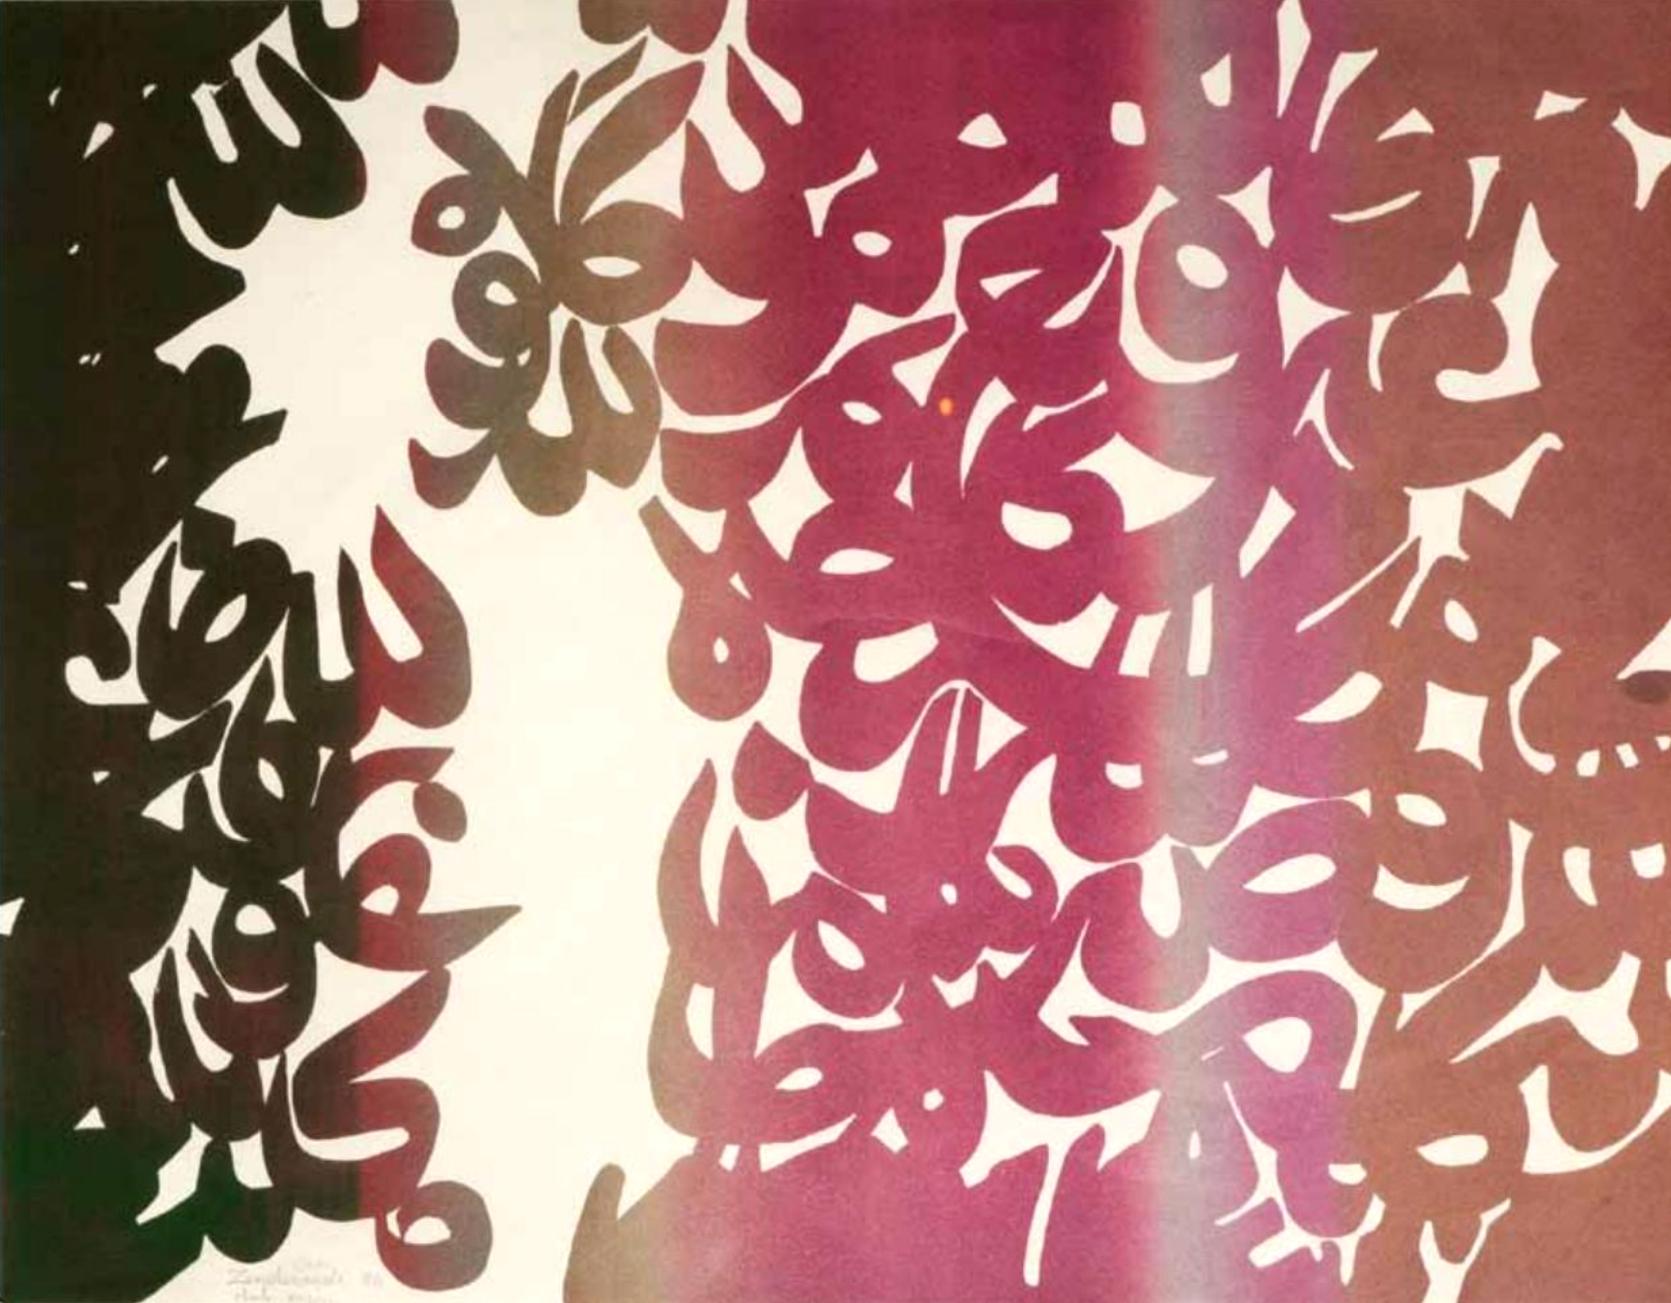 Charles Hossein Zenderoudi, Untitled, silkscreen on cardboard, 50 x 65 cm, 1984